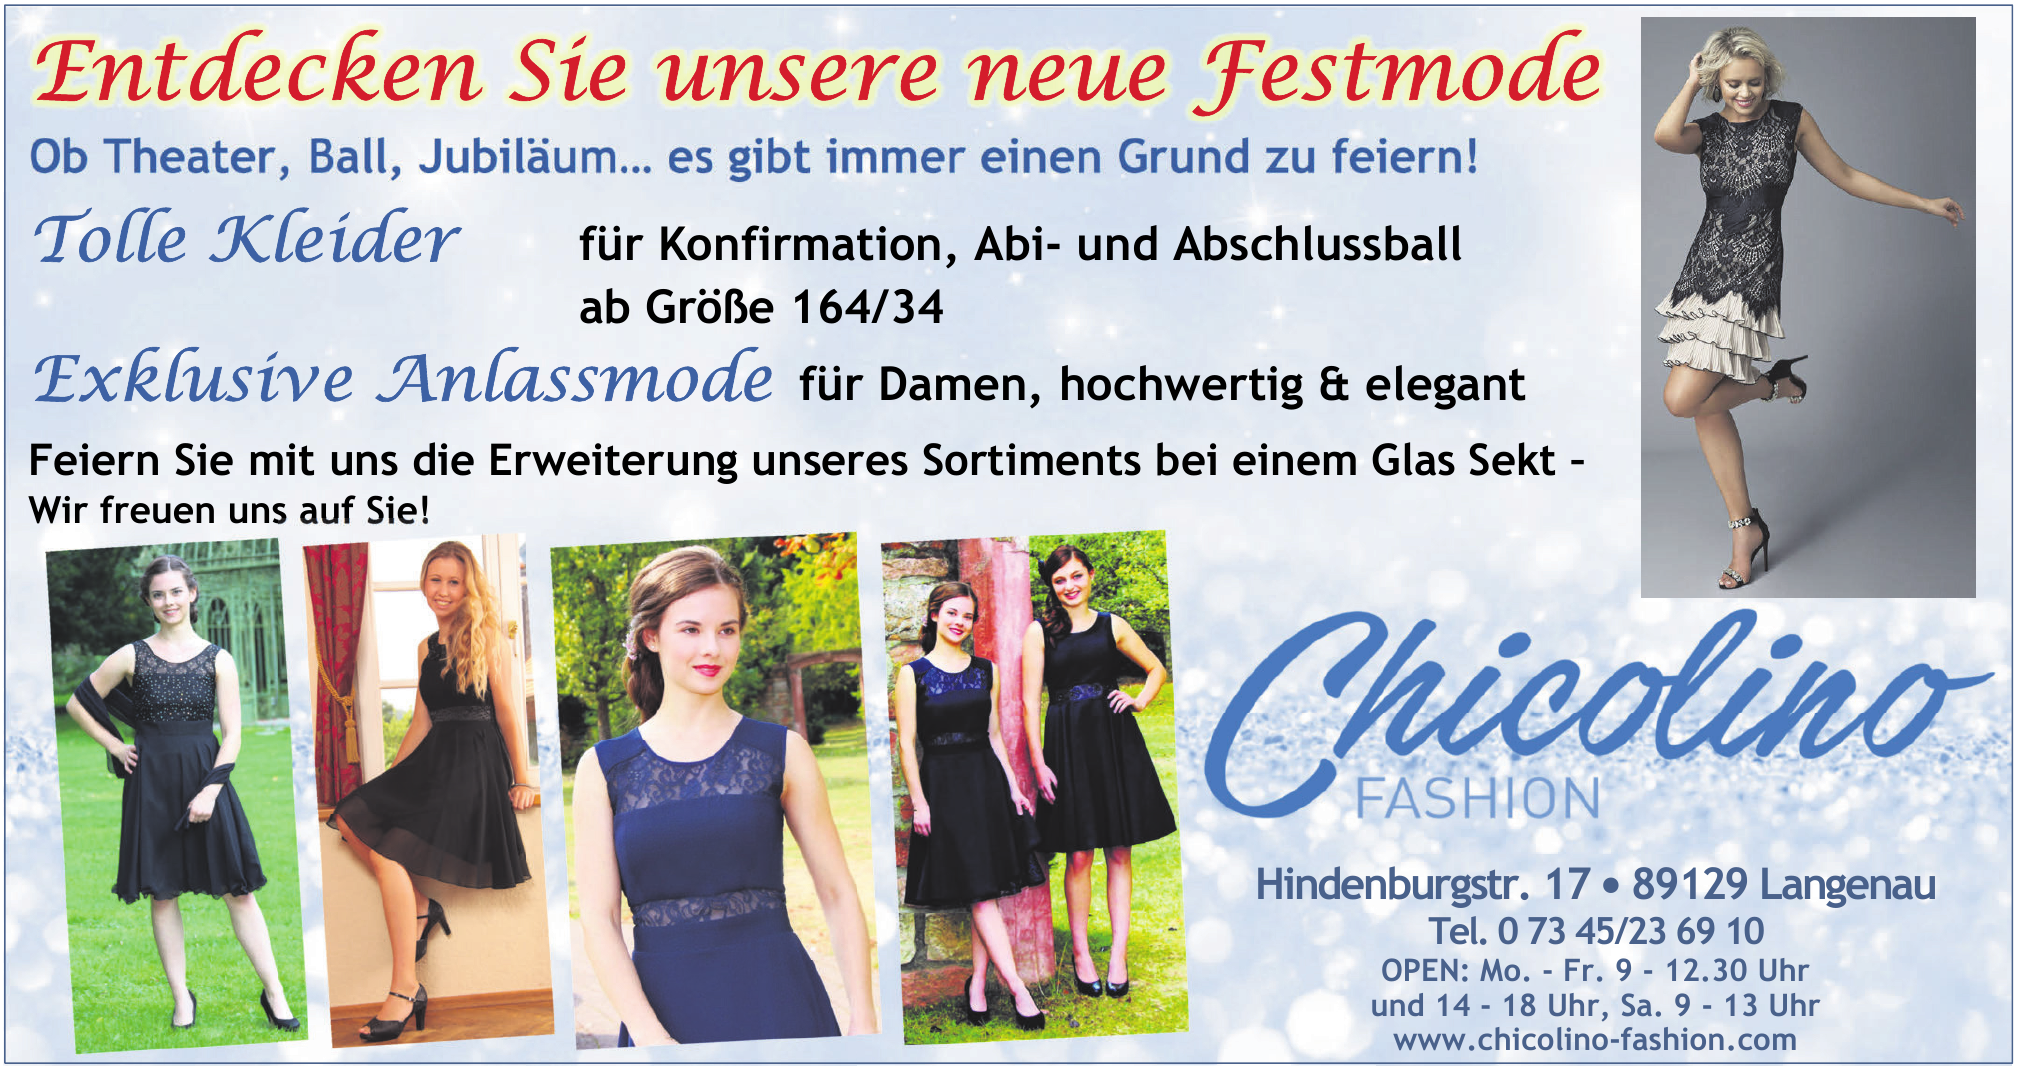 Chicolino Fashion